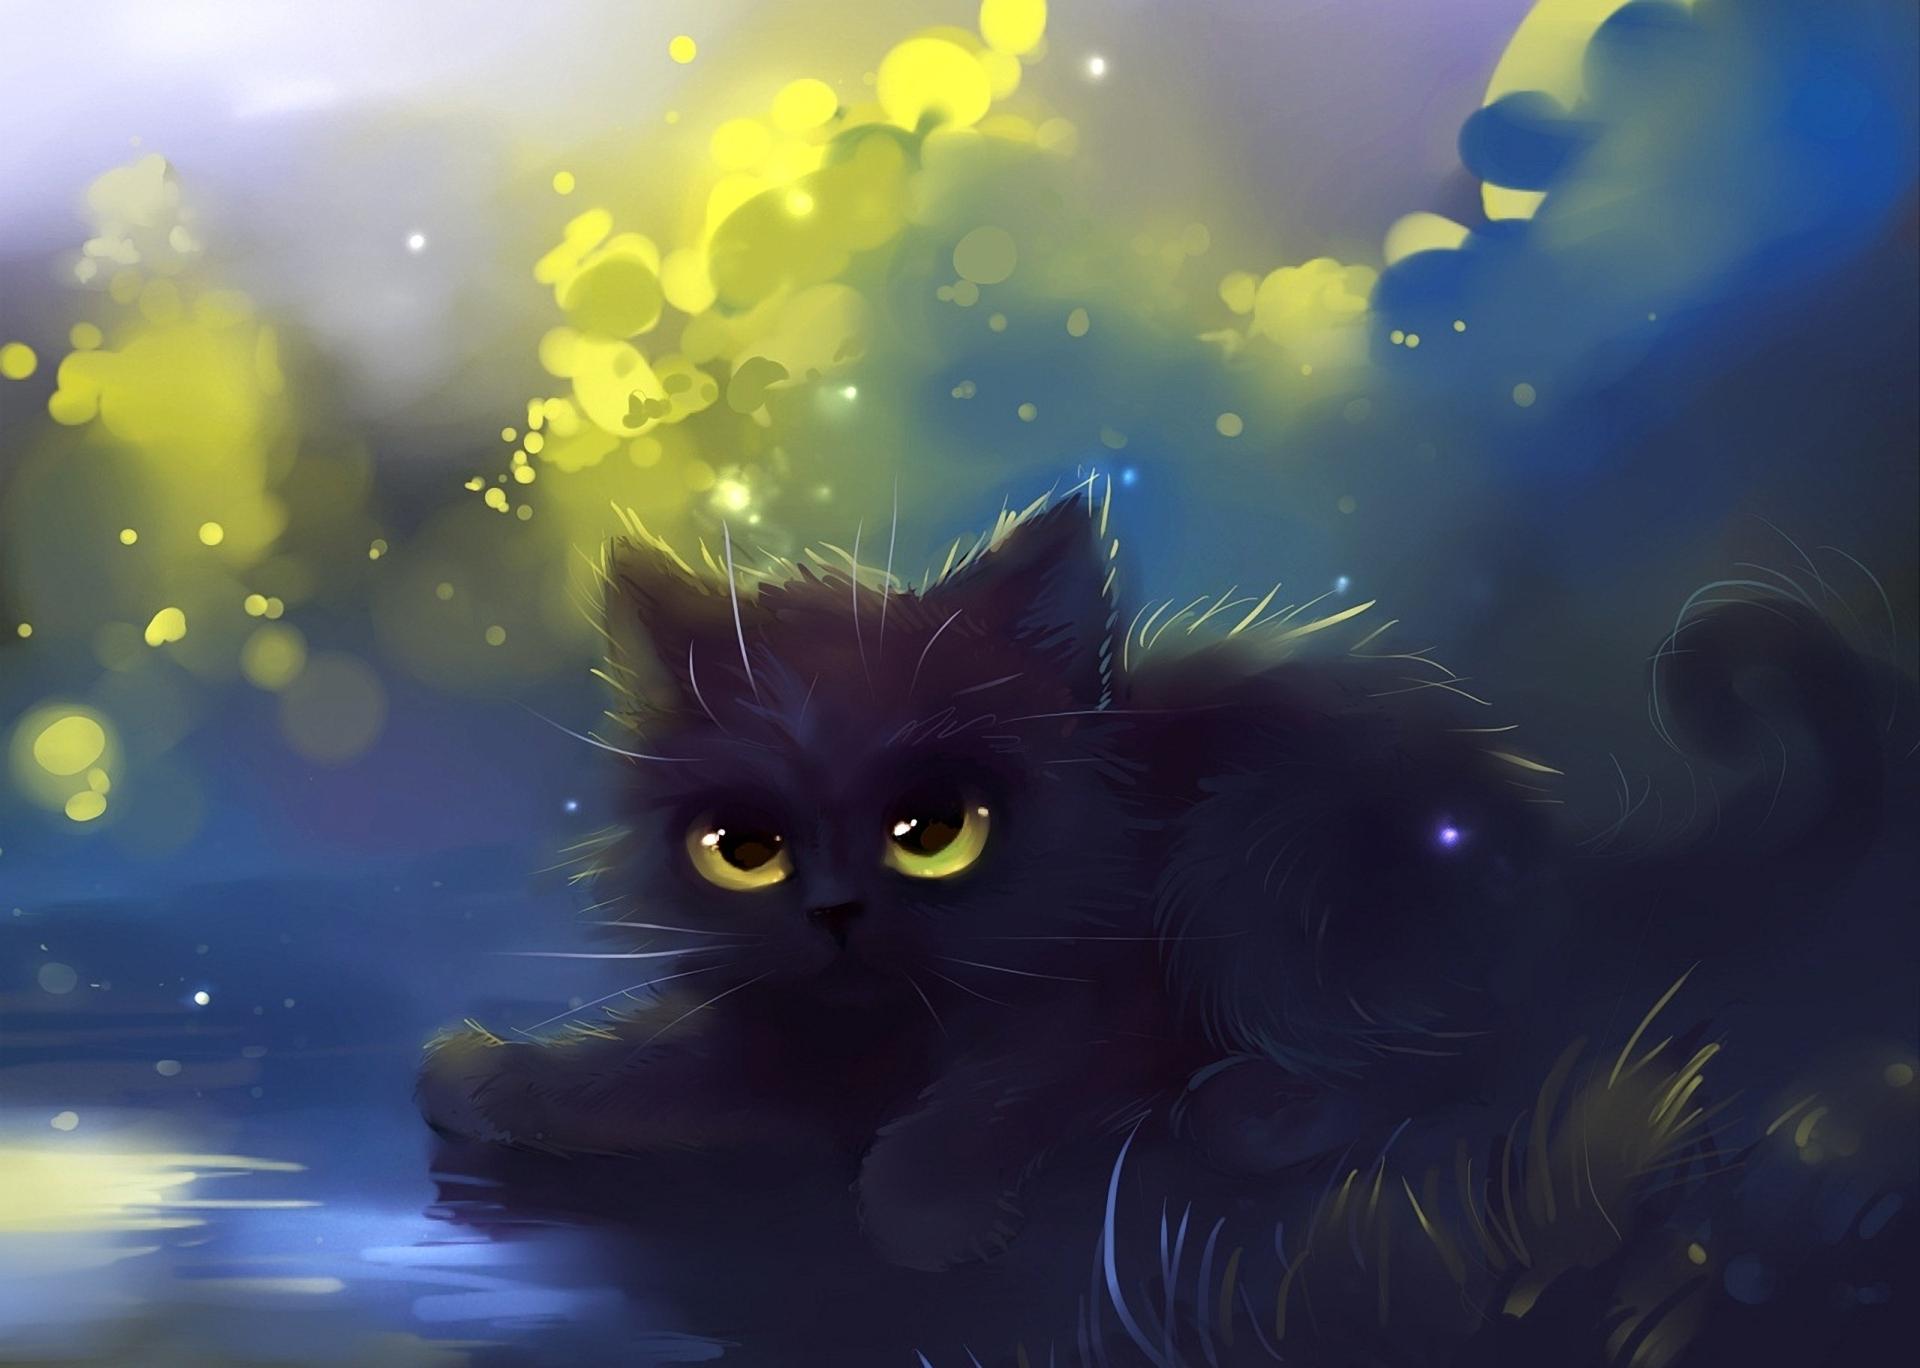 Drawn wallpaper cute anime cat Anime cat Cute ForWallpaper black